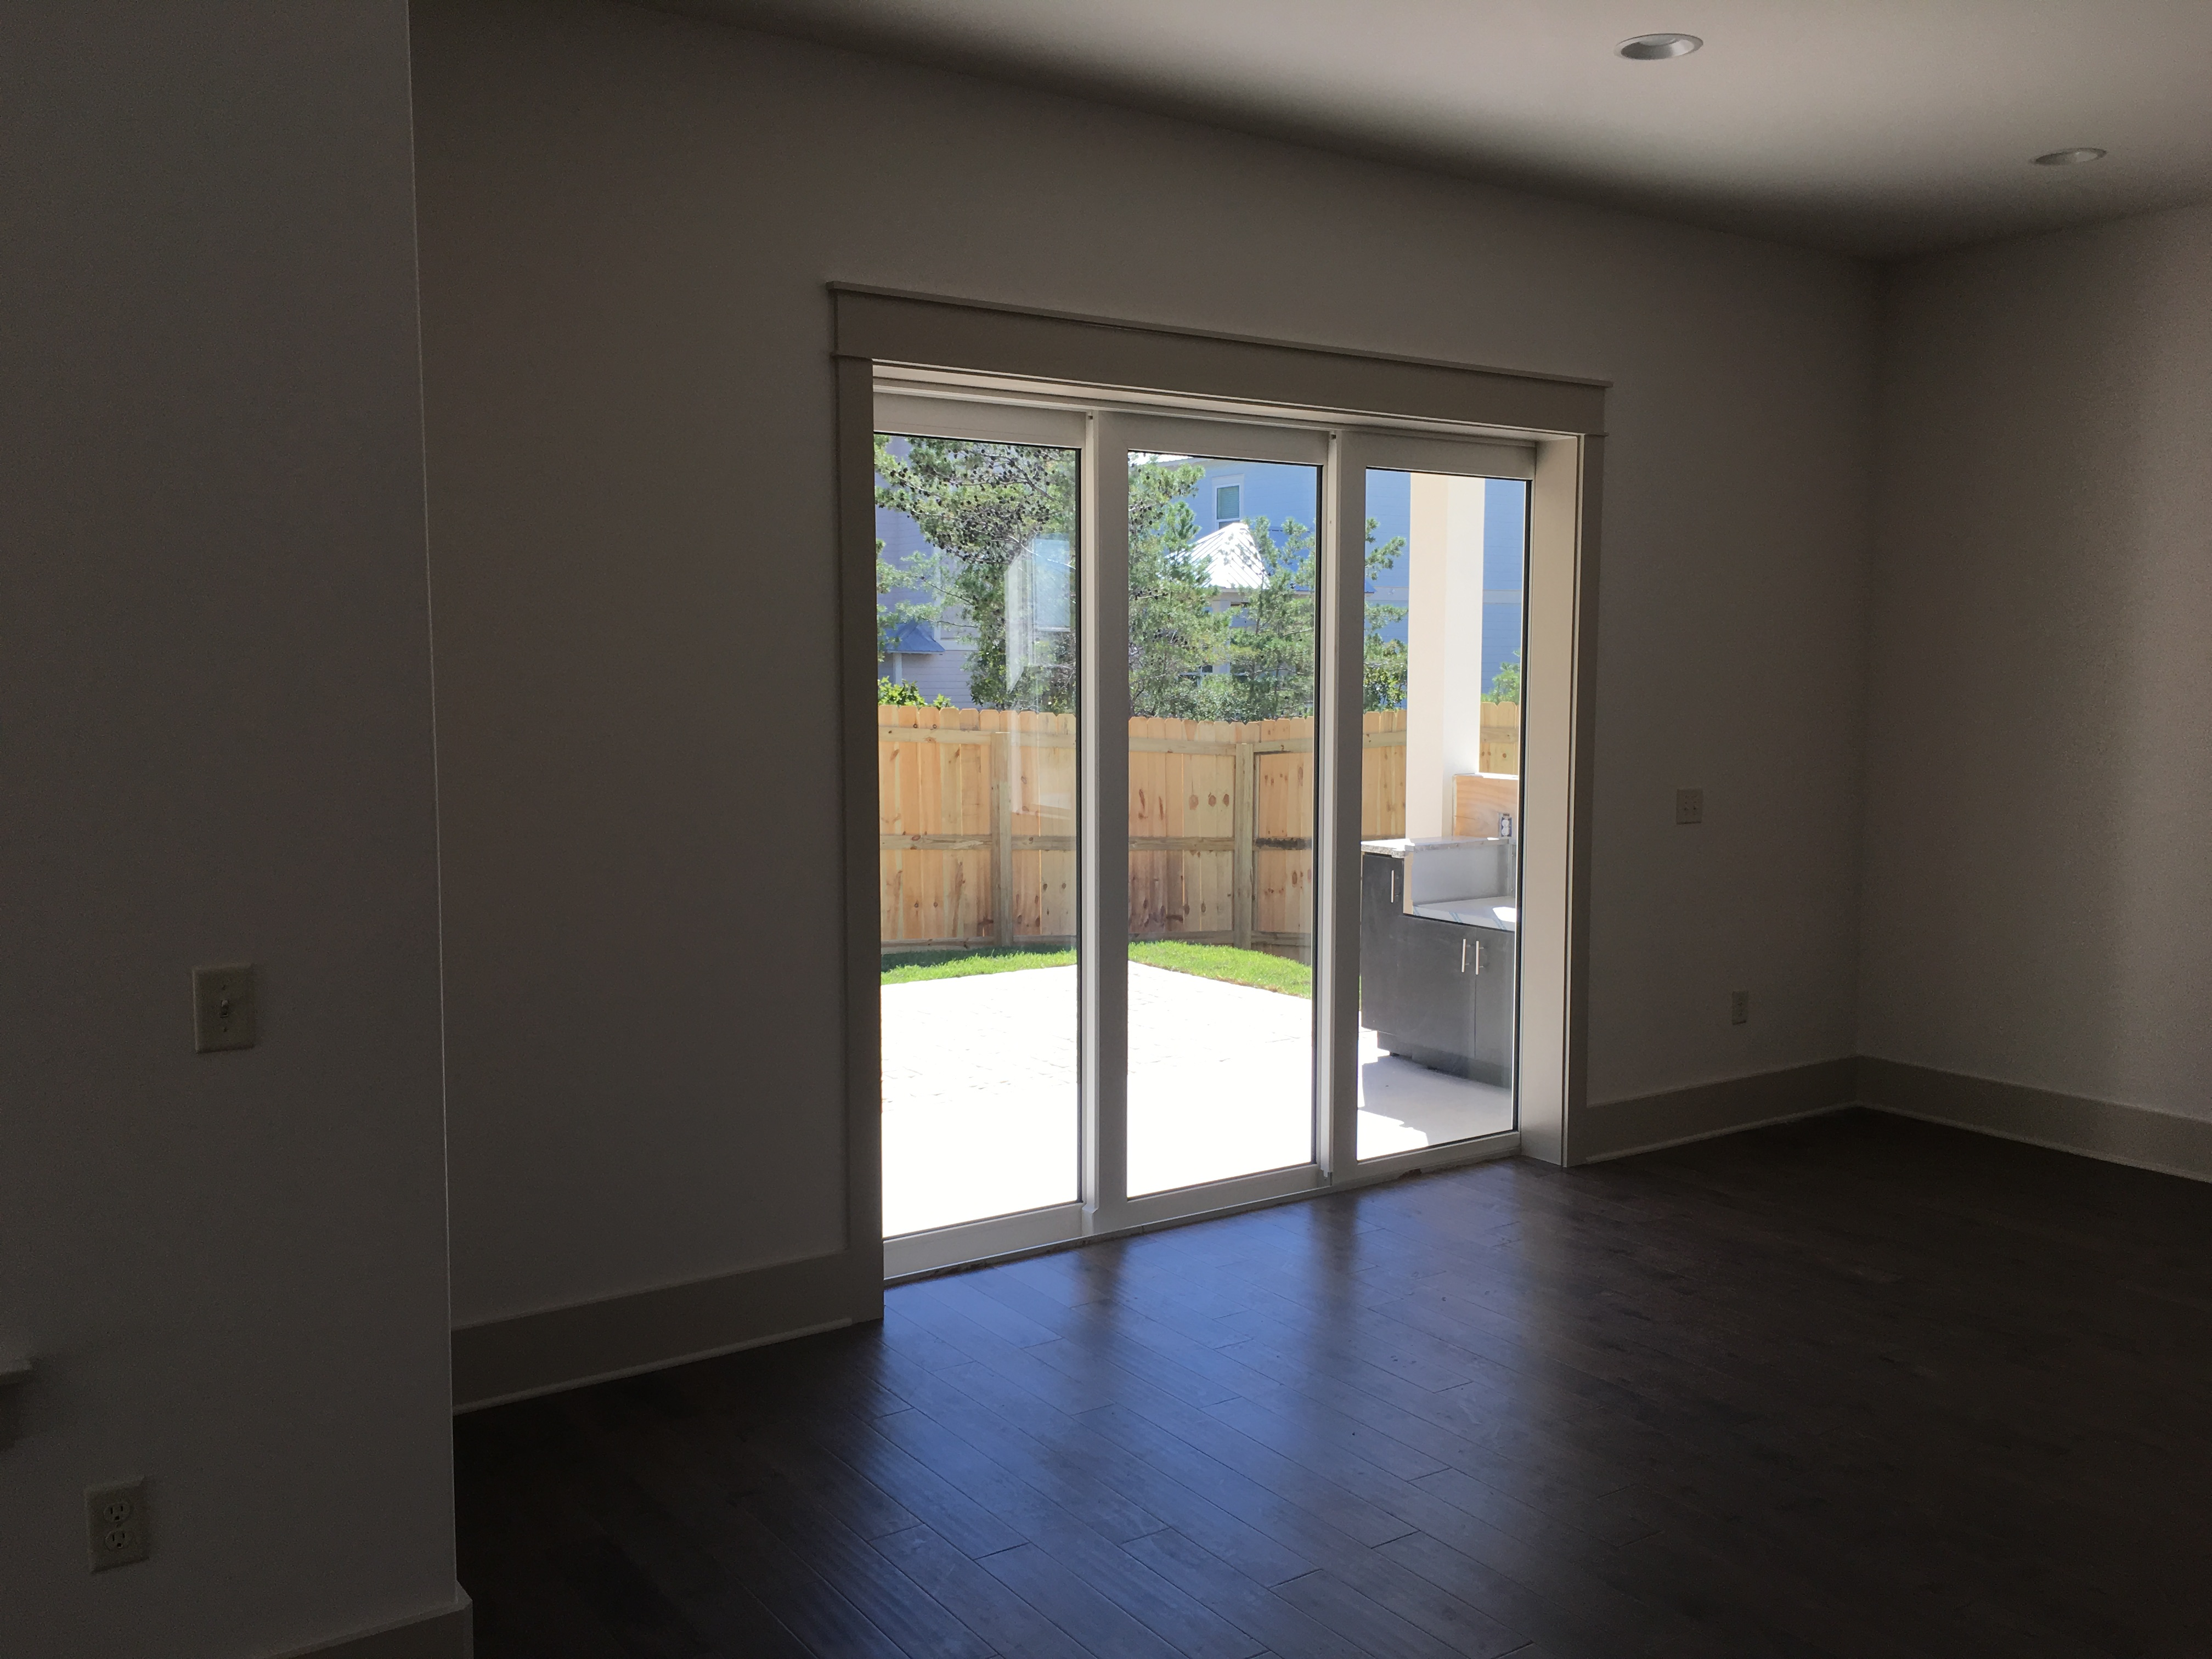 3 Panel Sliding Doors Windows Siding And Doors Contractor Talk